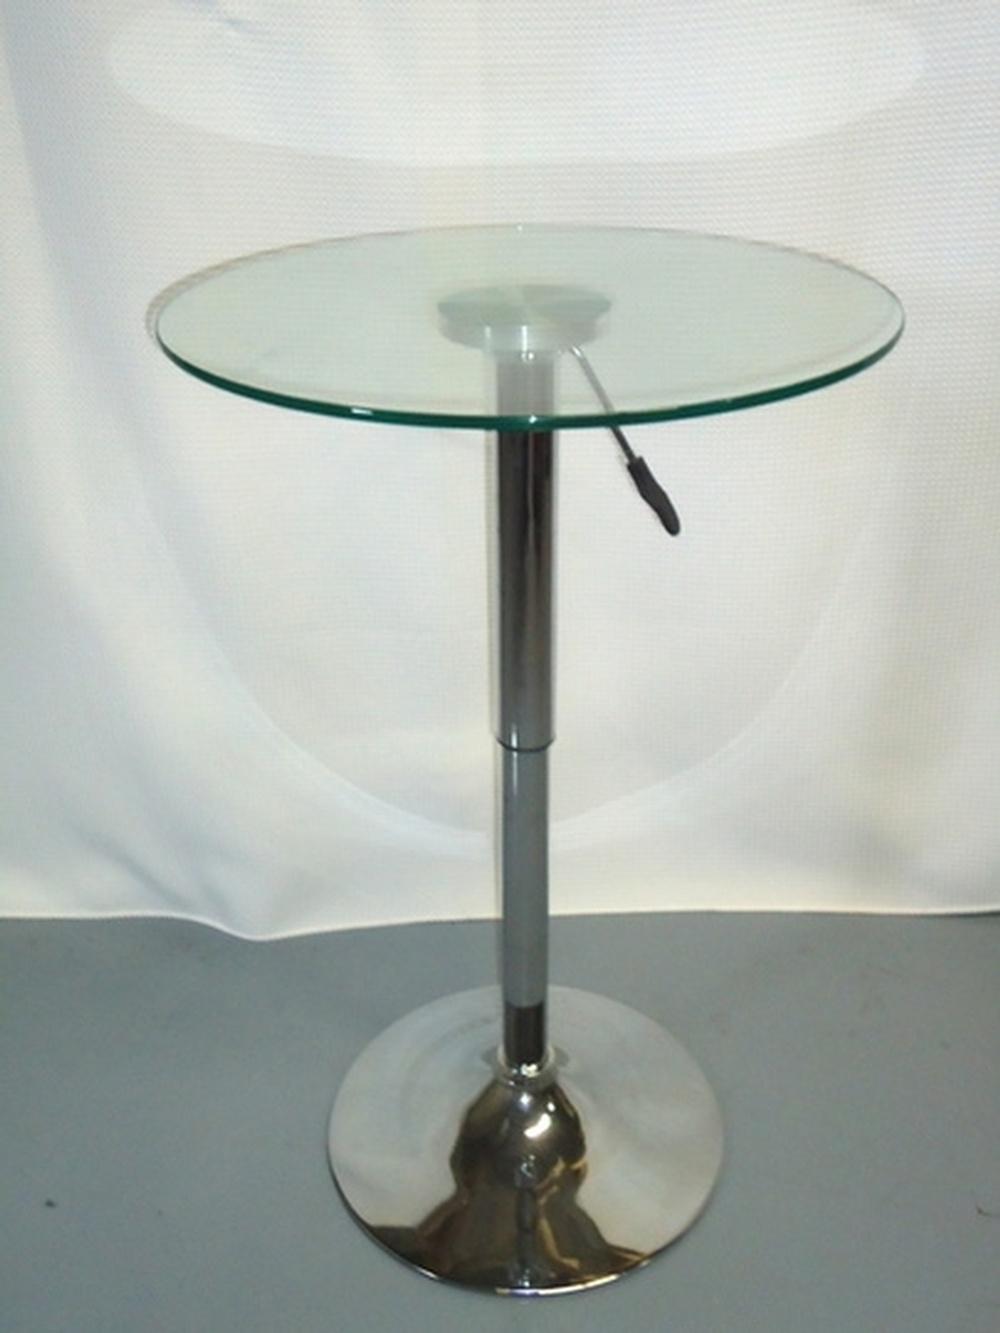 Charmant Glass Top Bar Height Table